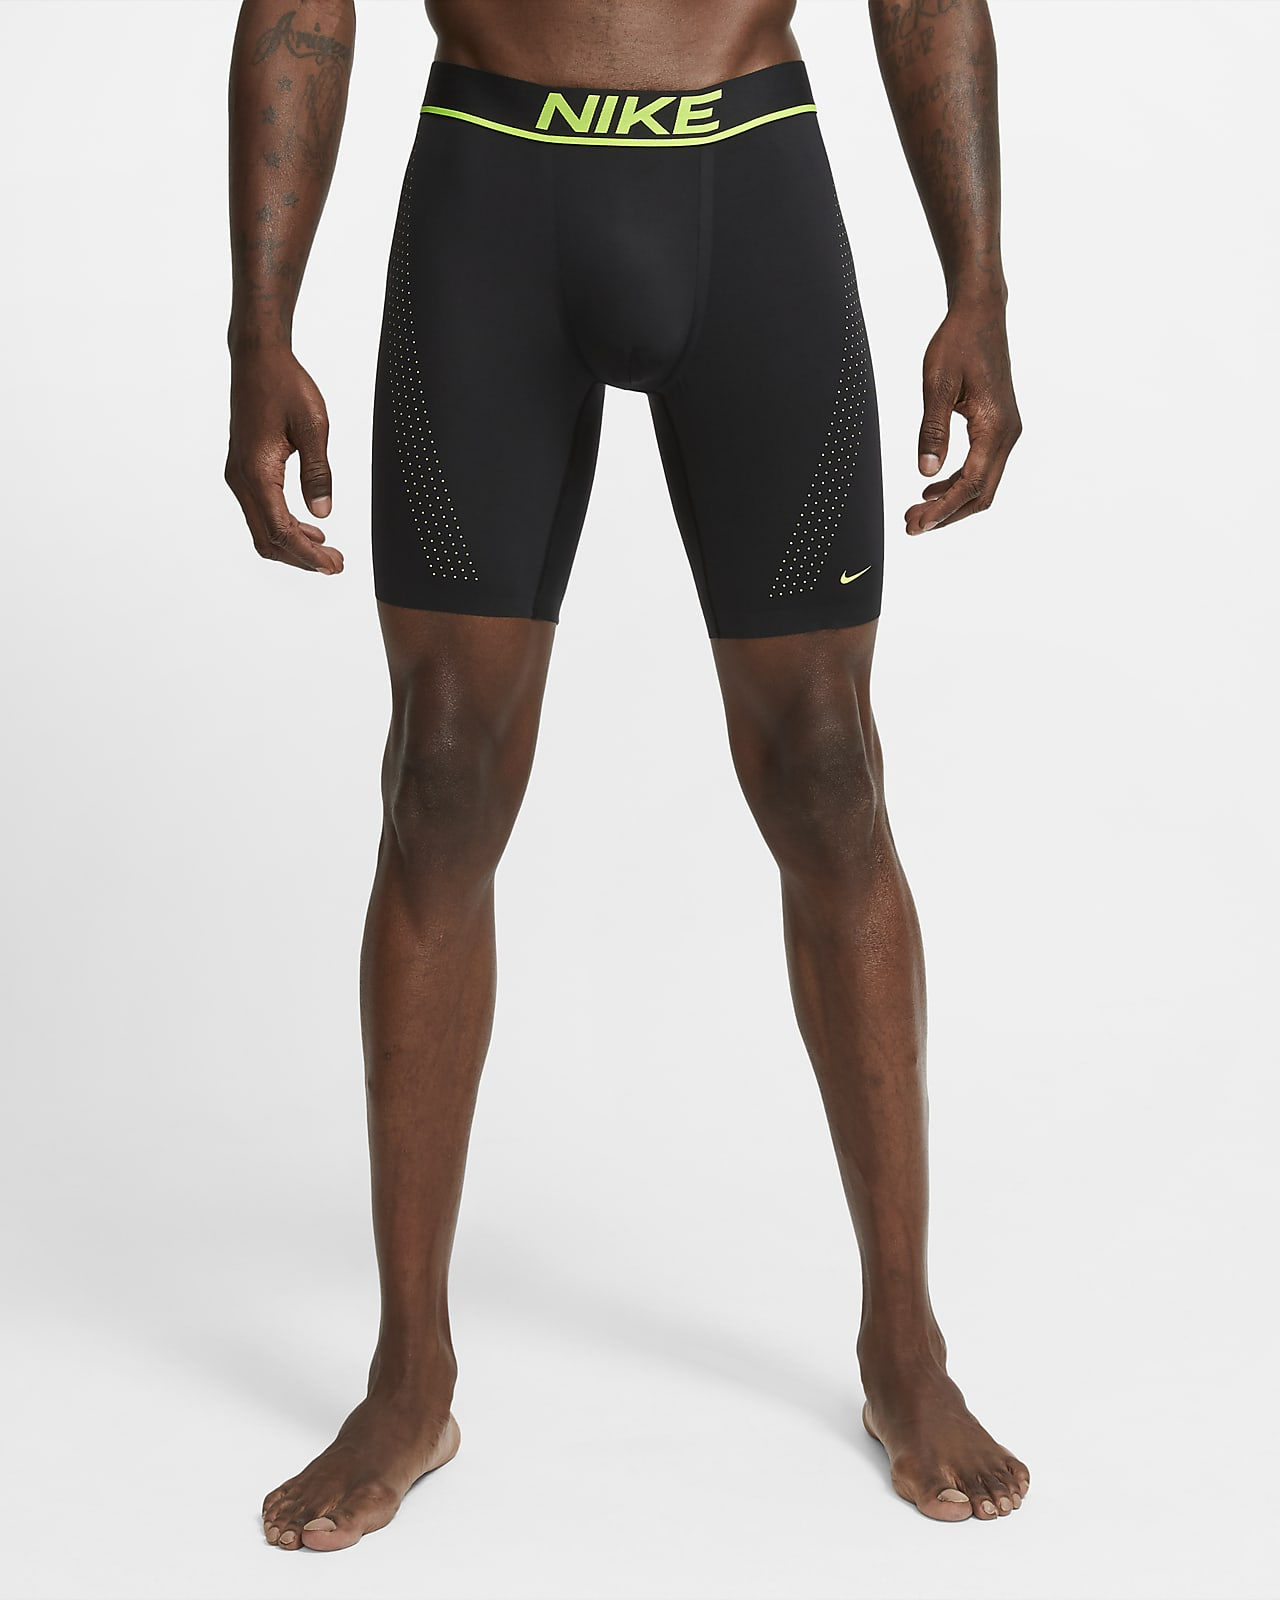 Nike Elite Micro Men's Long Boxer Briefs